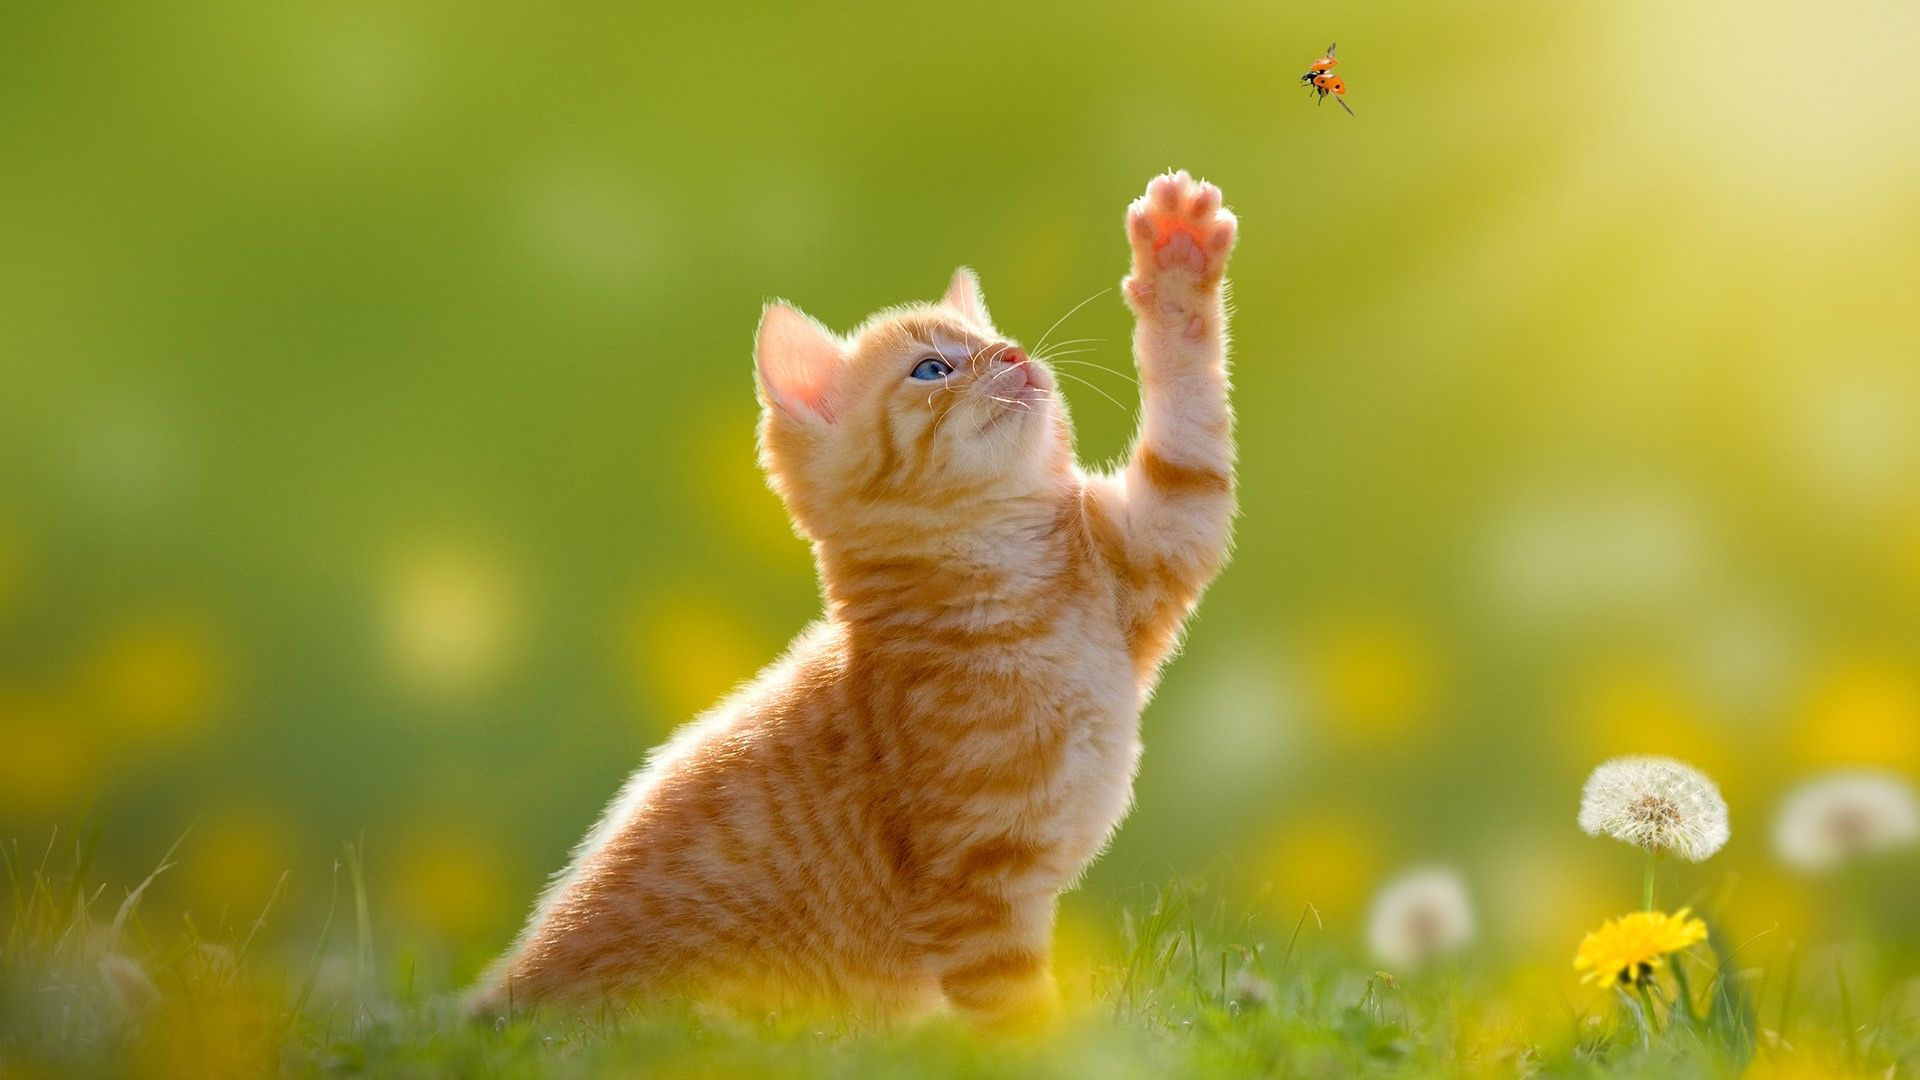 Kitten And A Ladybug Desktop Wallpaper 1920x1080 Baby Cats